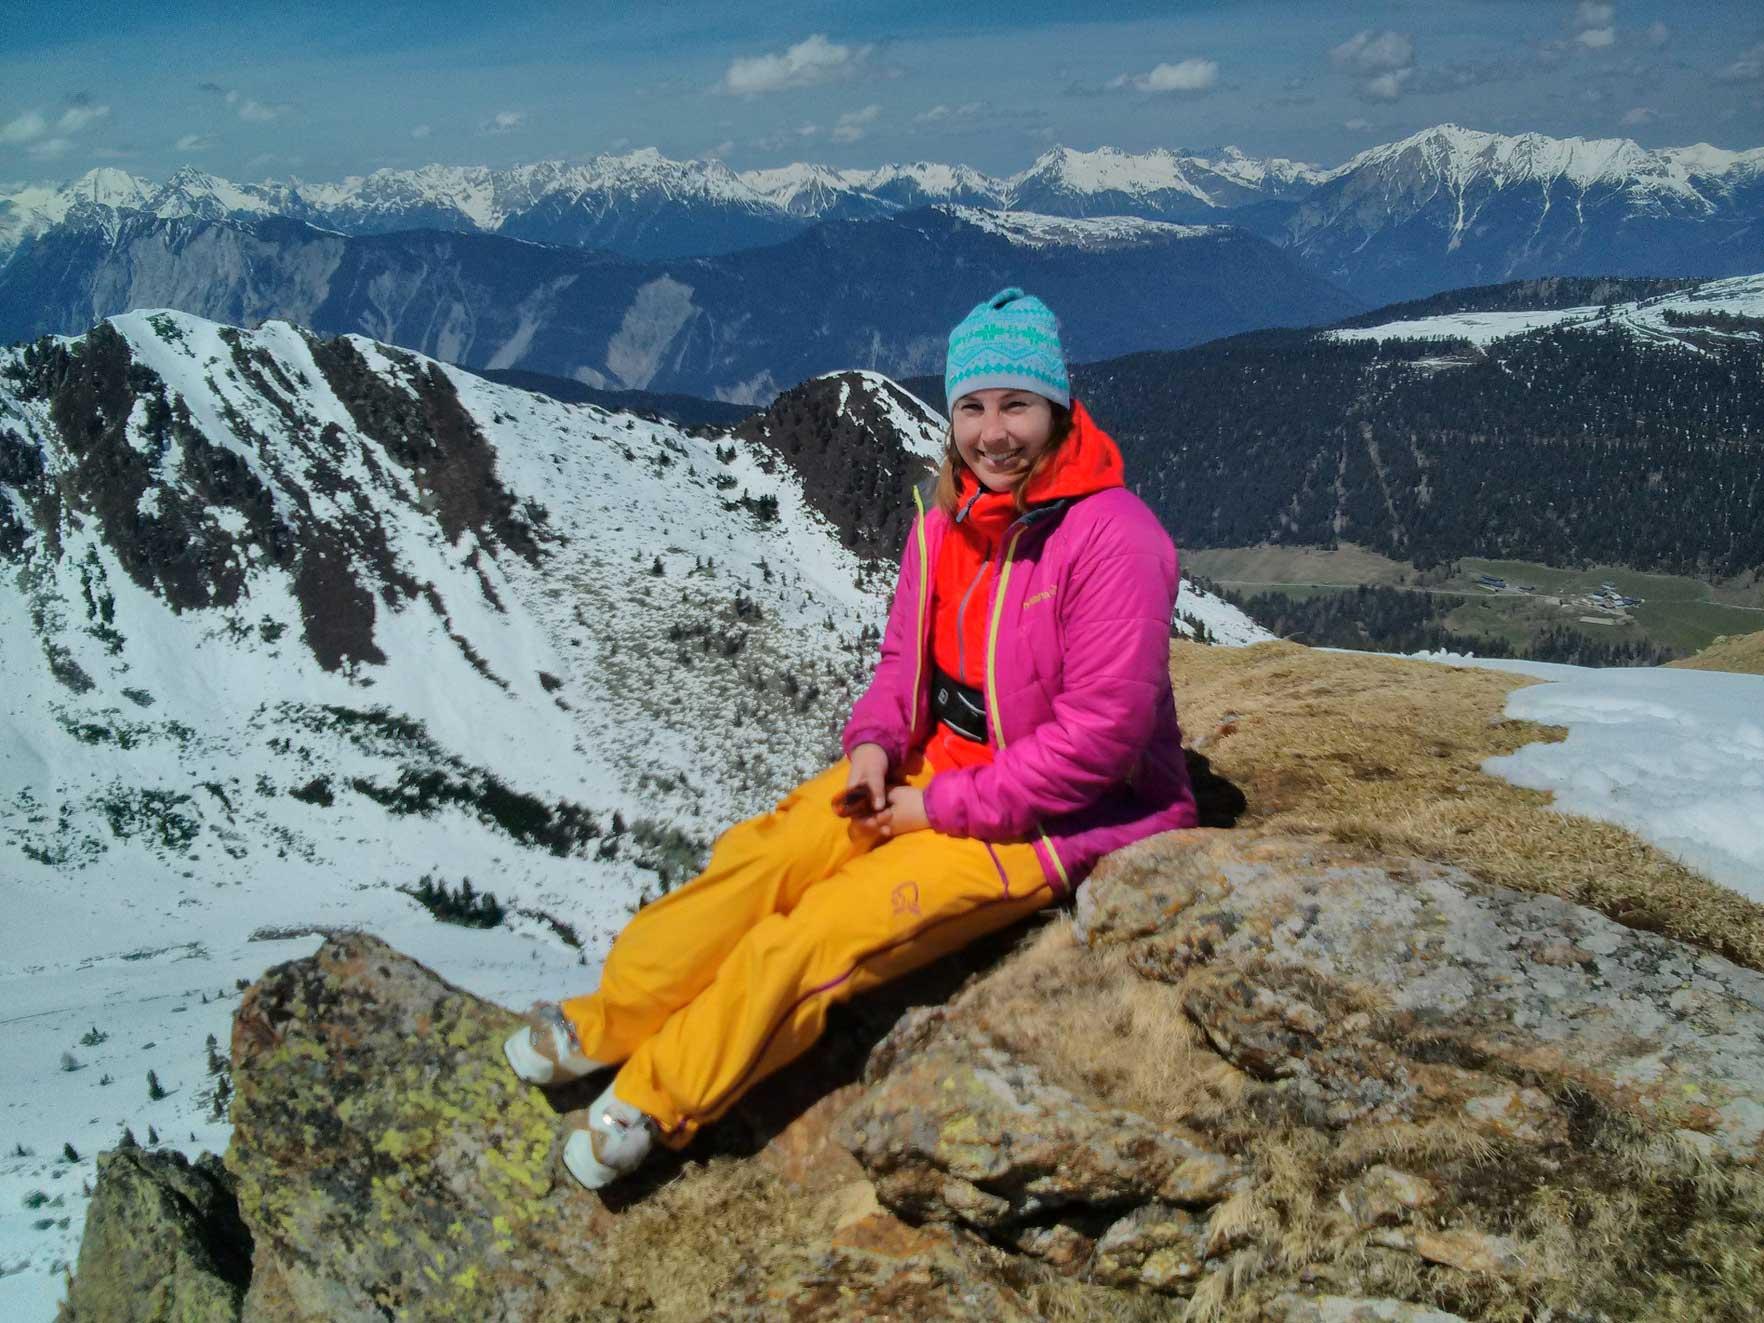 munichmountaingirls-bergblog-frauen-nina-schwind-skitour-kuehtai-schafzoll